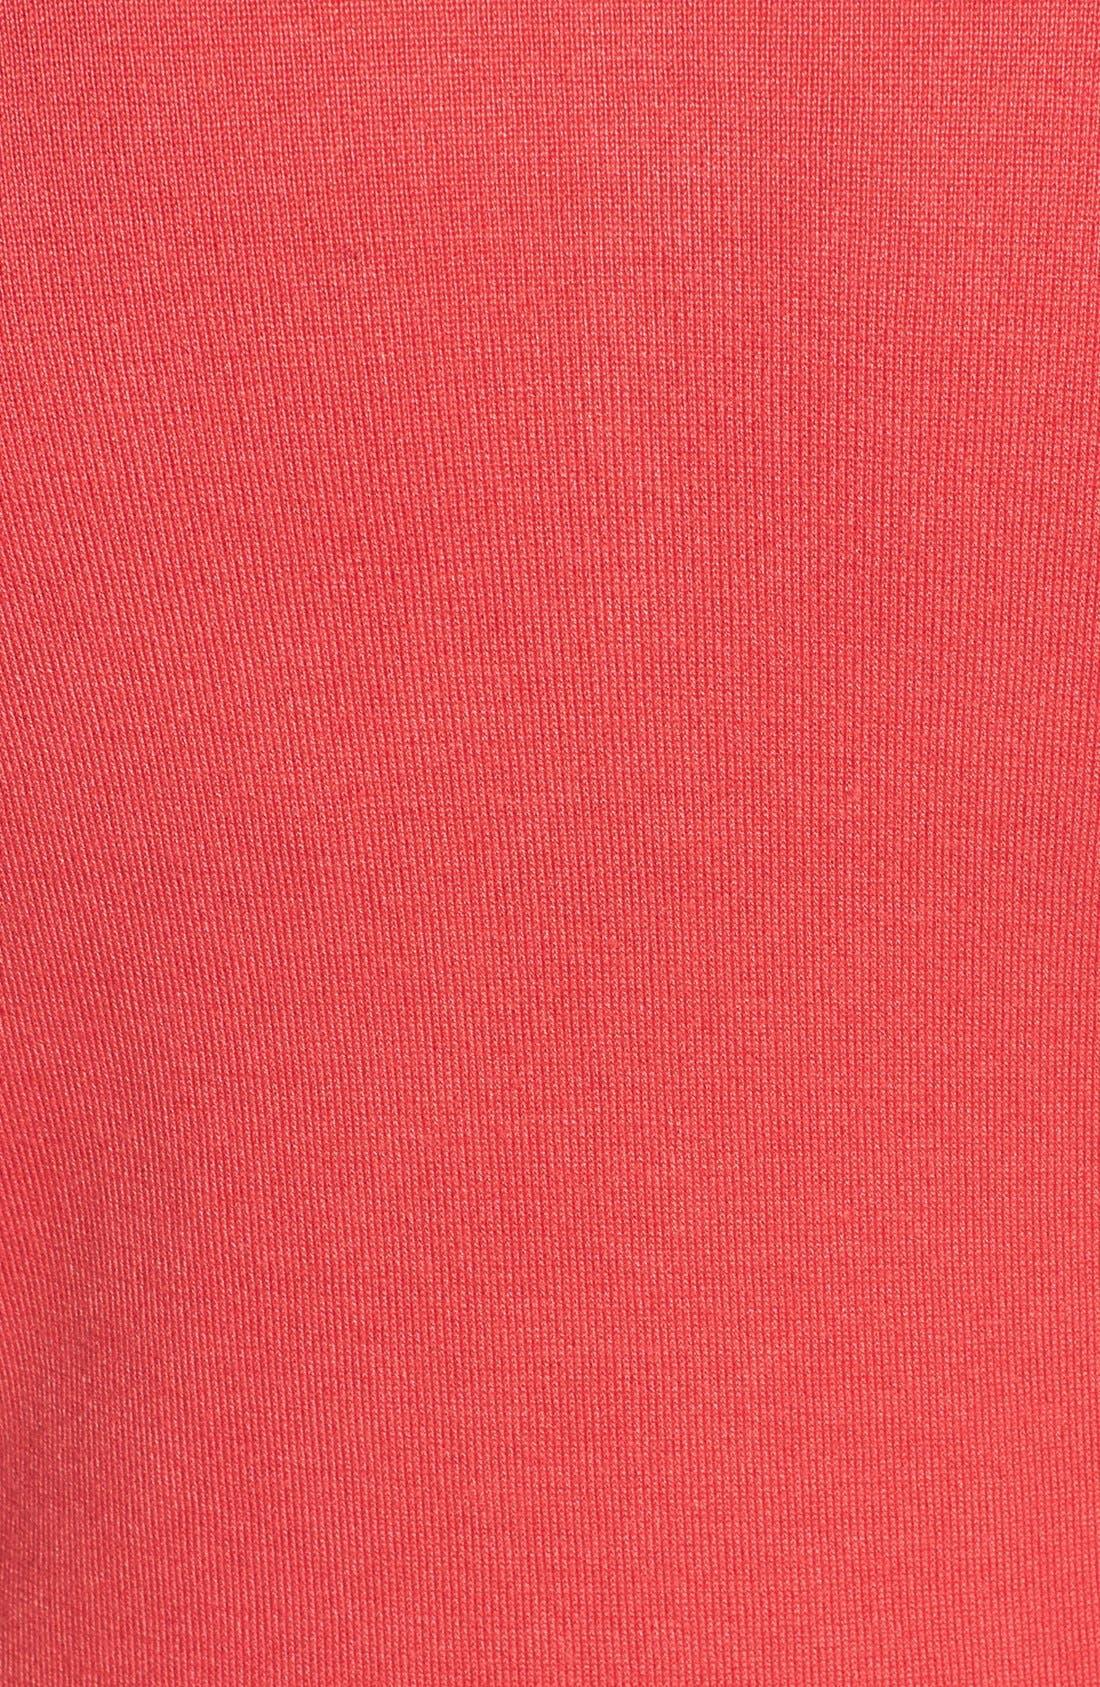 Three Quarter Sleeve Cardigan,                             Alternate thumbnail 177, color,